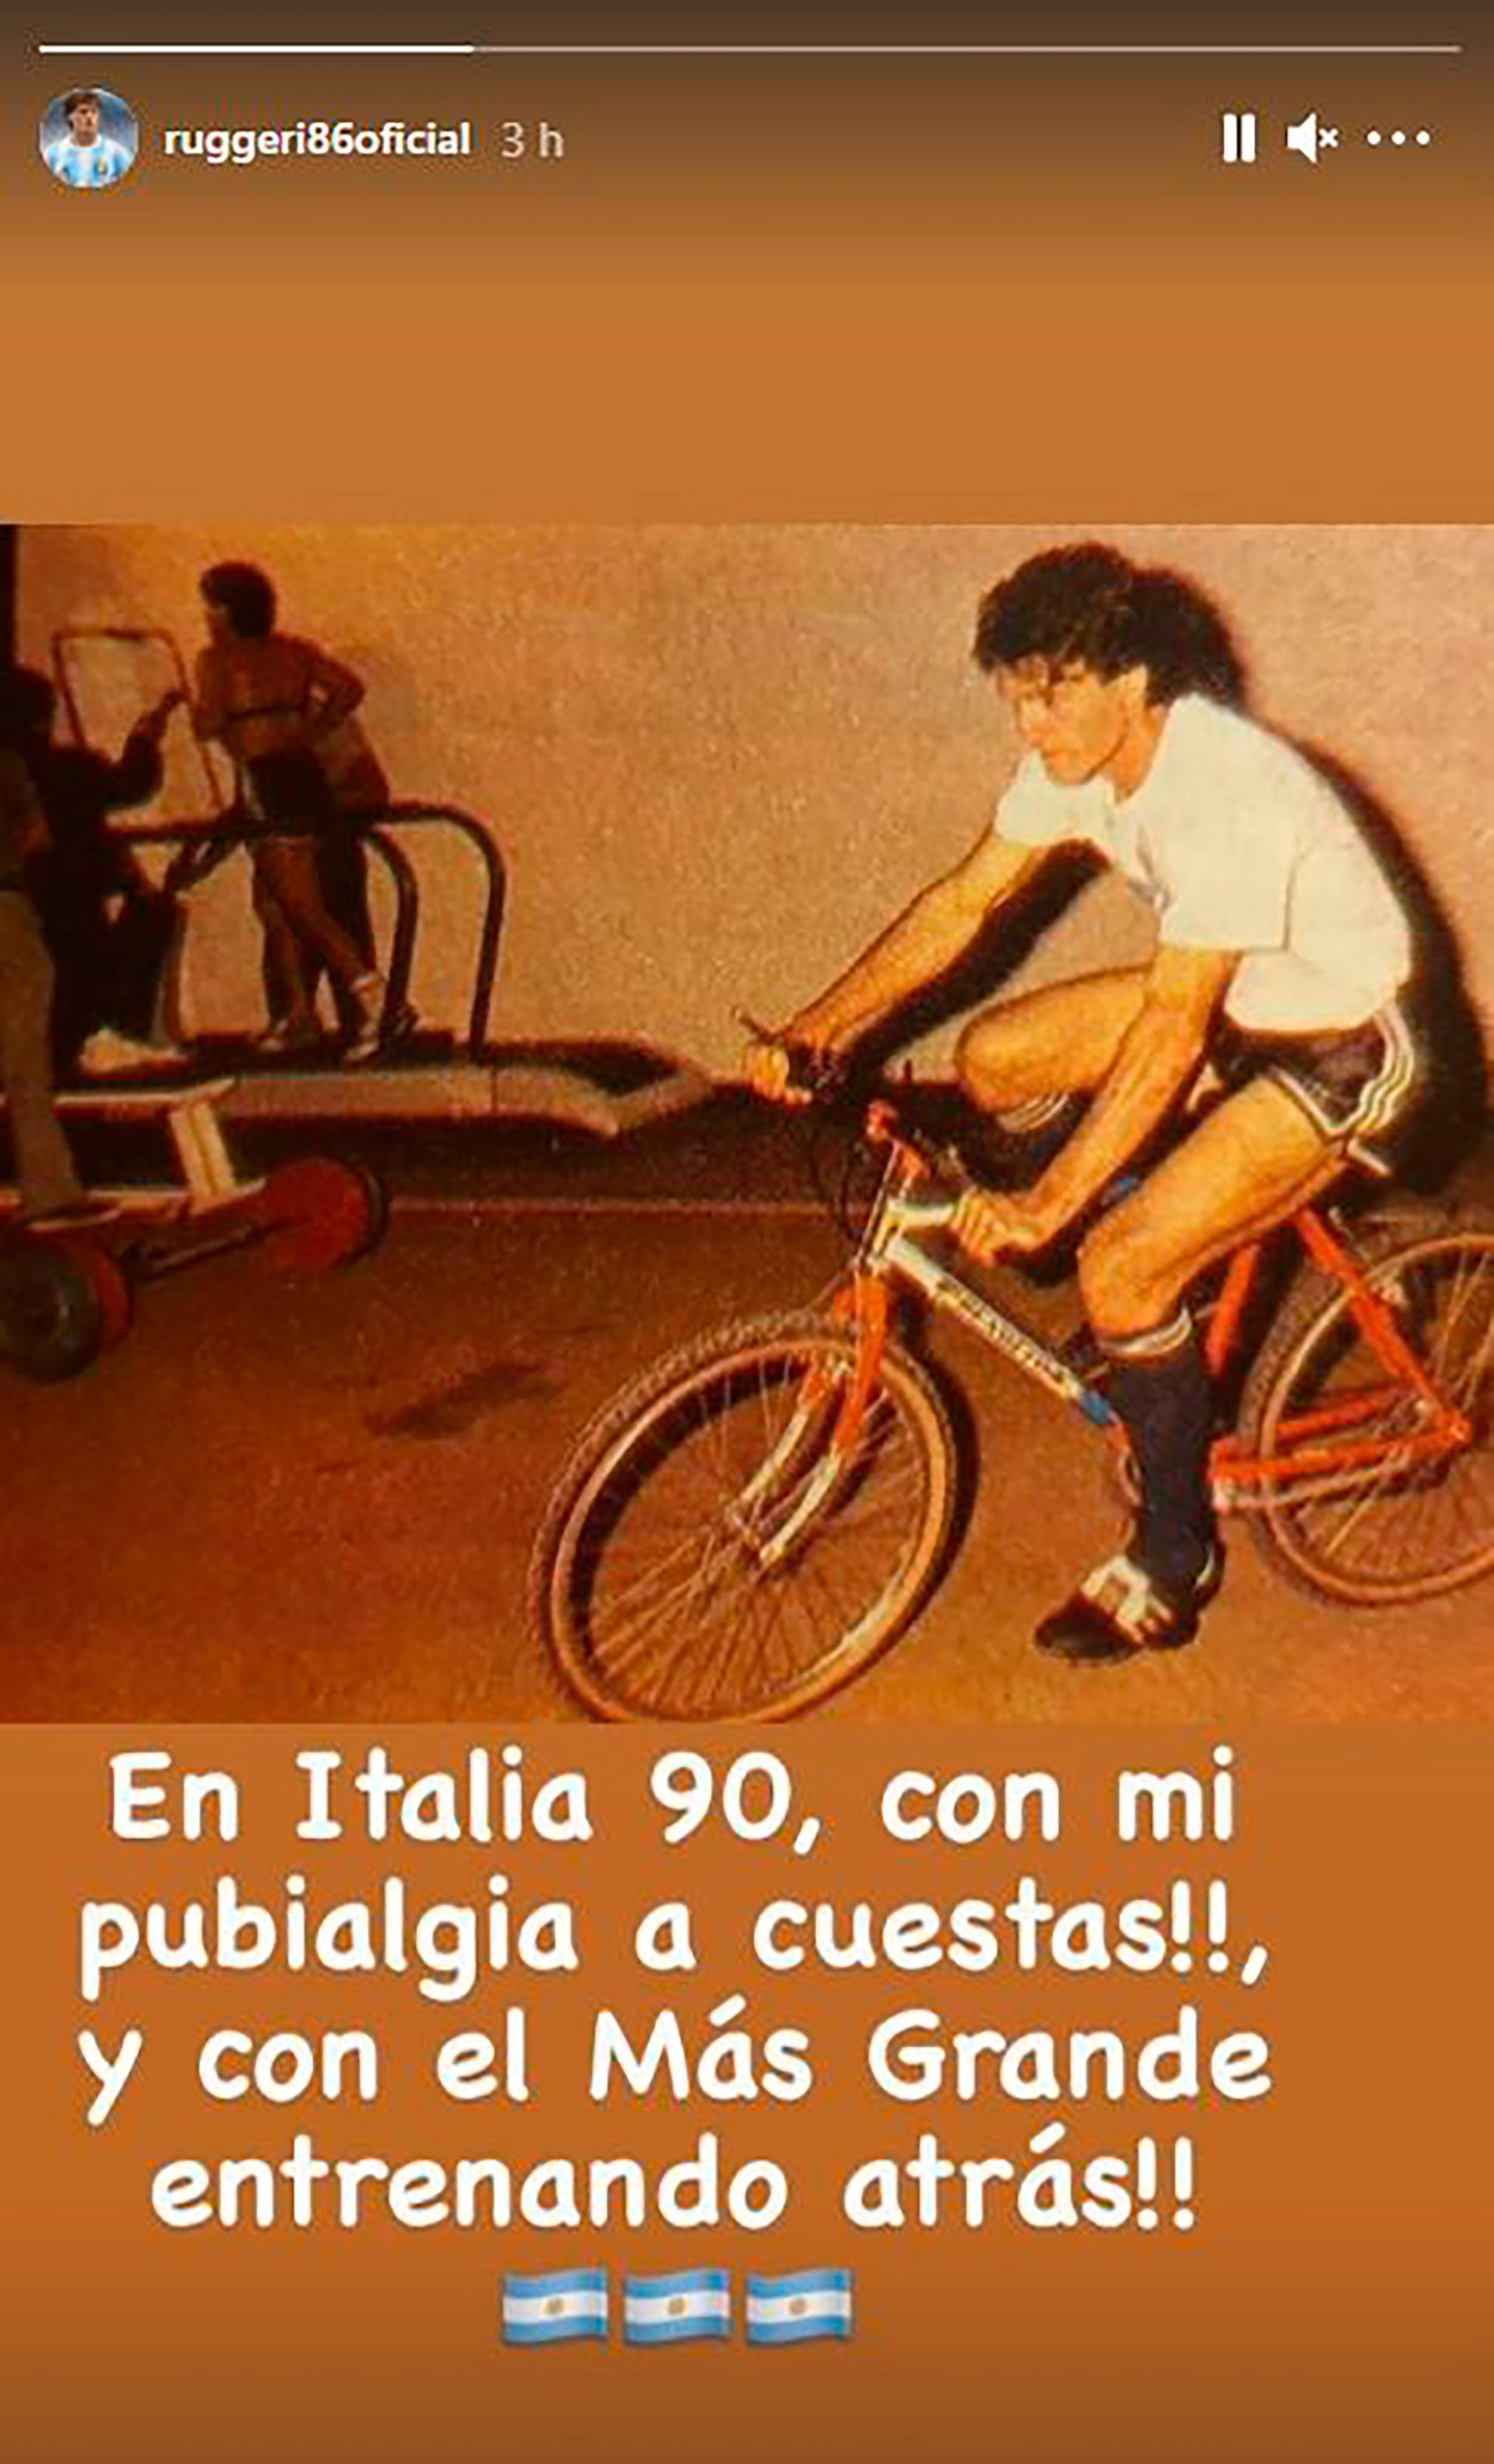 Ruggeri-Maradona Italia 90